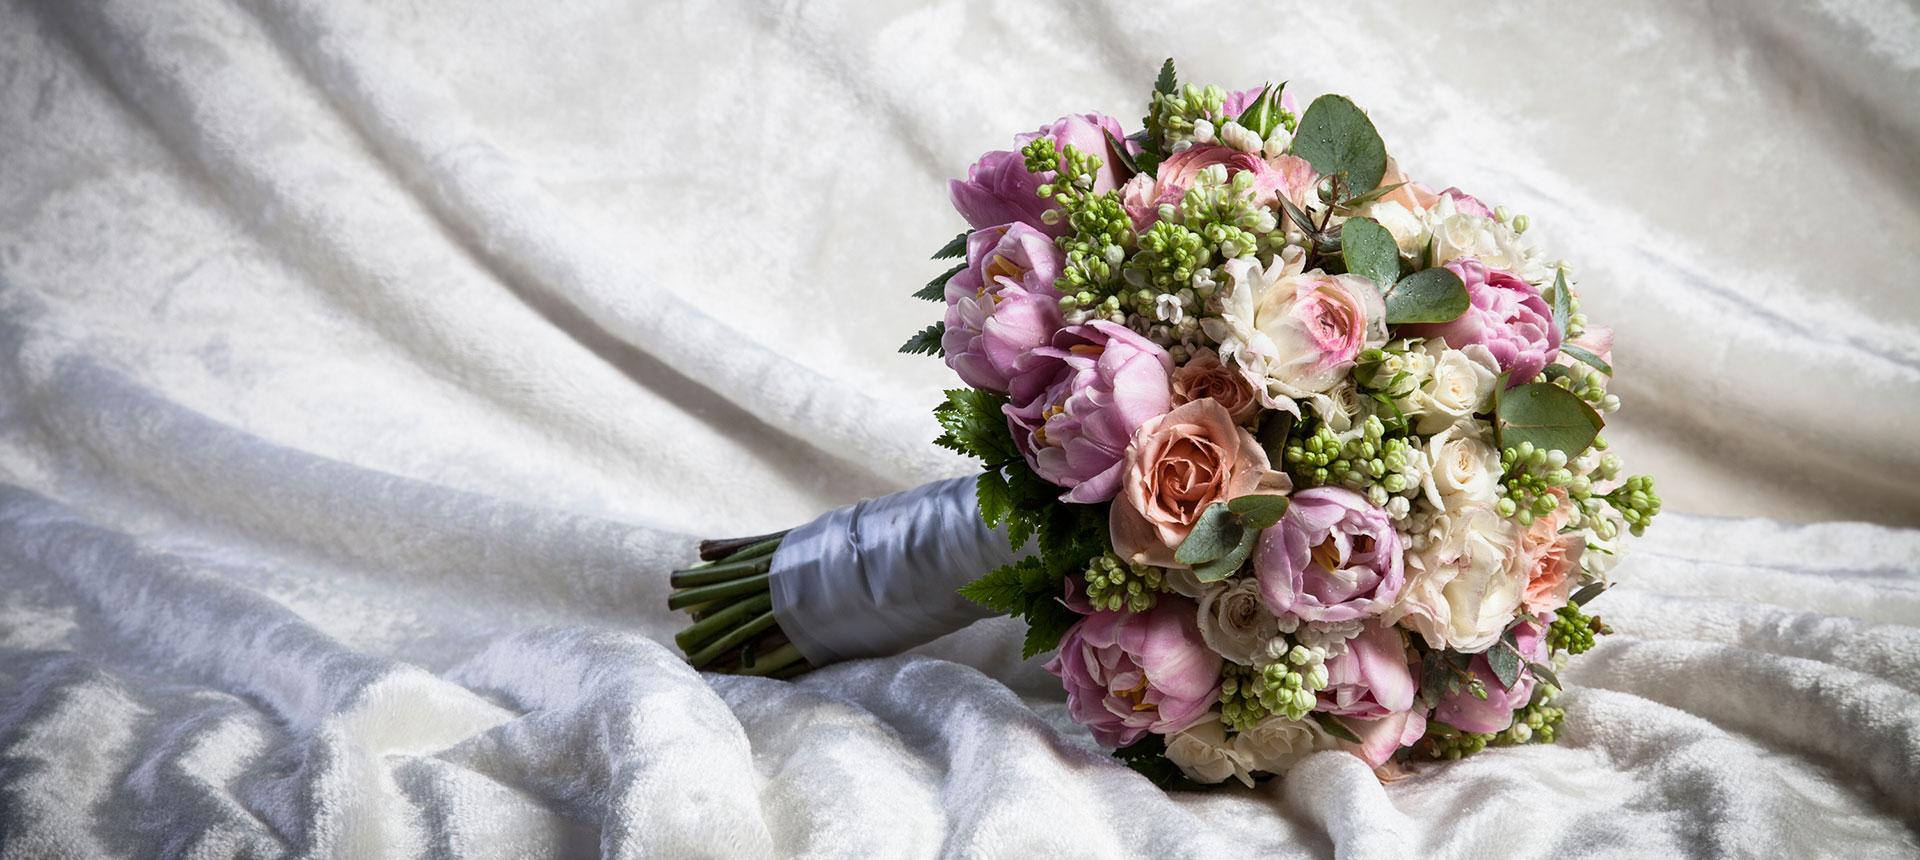 fotografia-producto-flores-fina-felguera-fotografo-09-slide